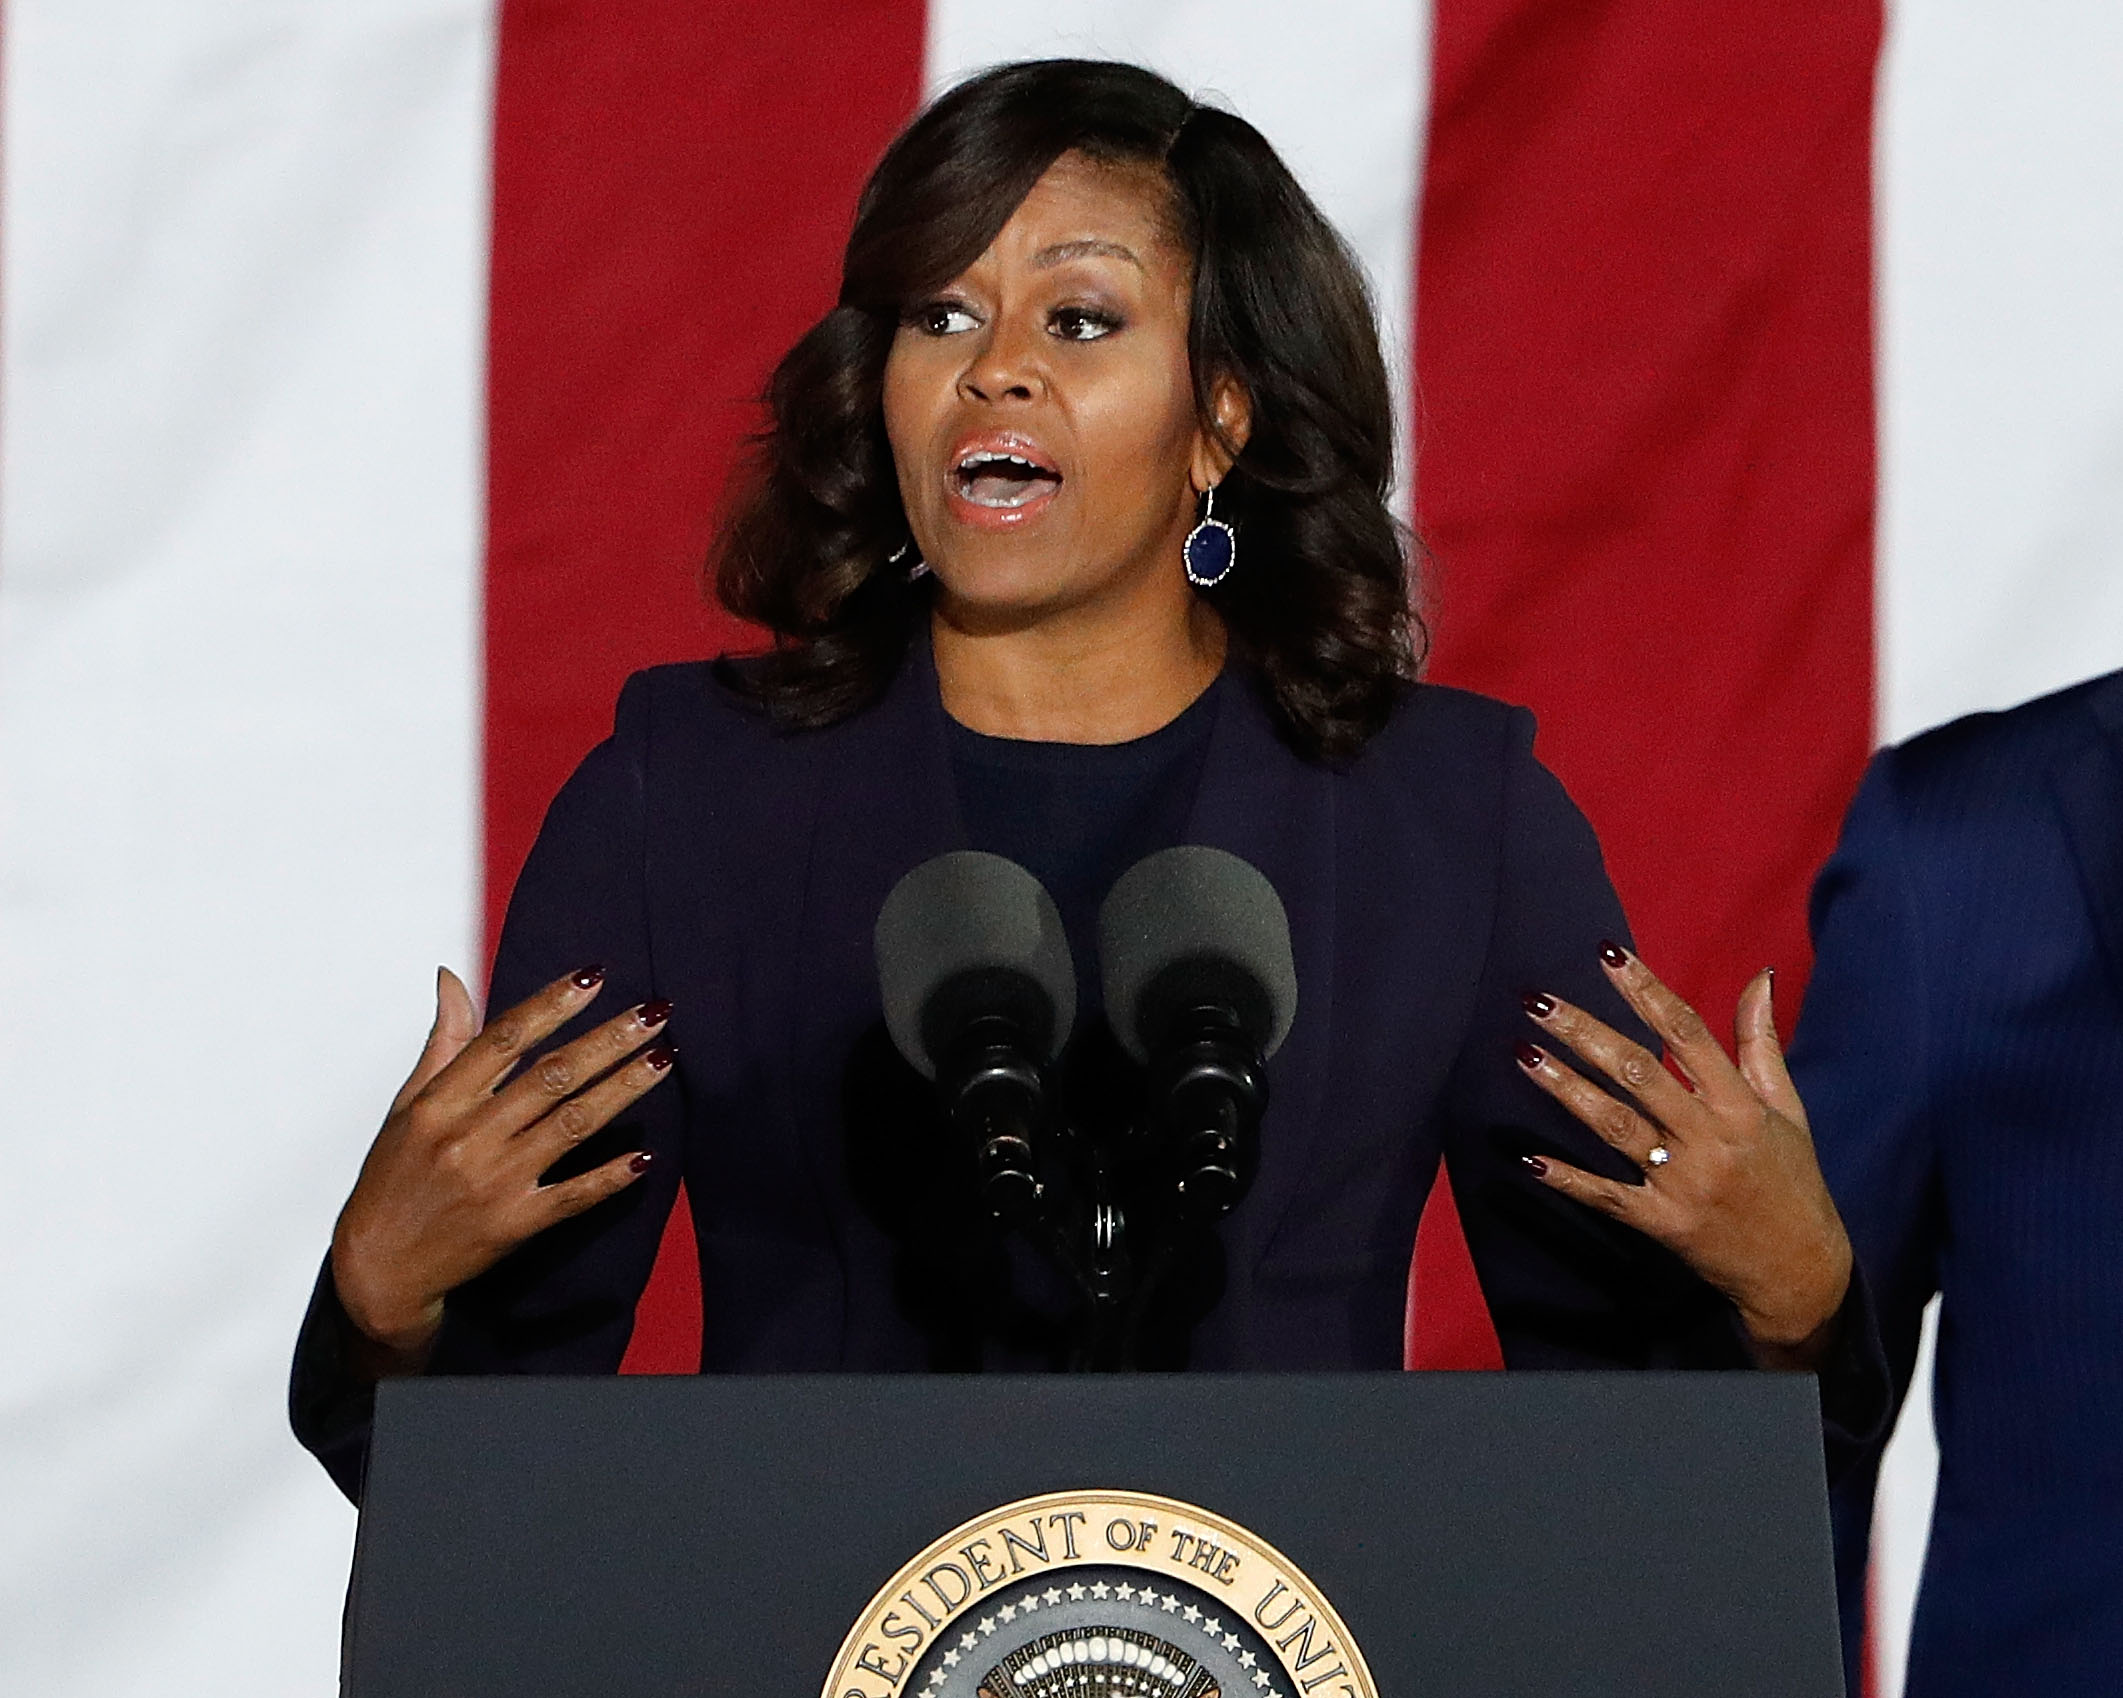 Alabama Cop Fired Over Meme Calling Michelle Obama 'Fluent In Ghetto'